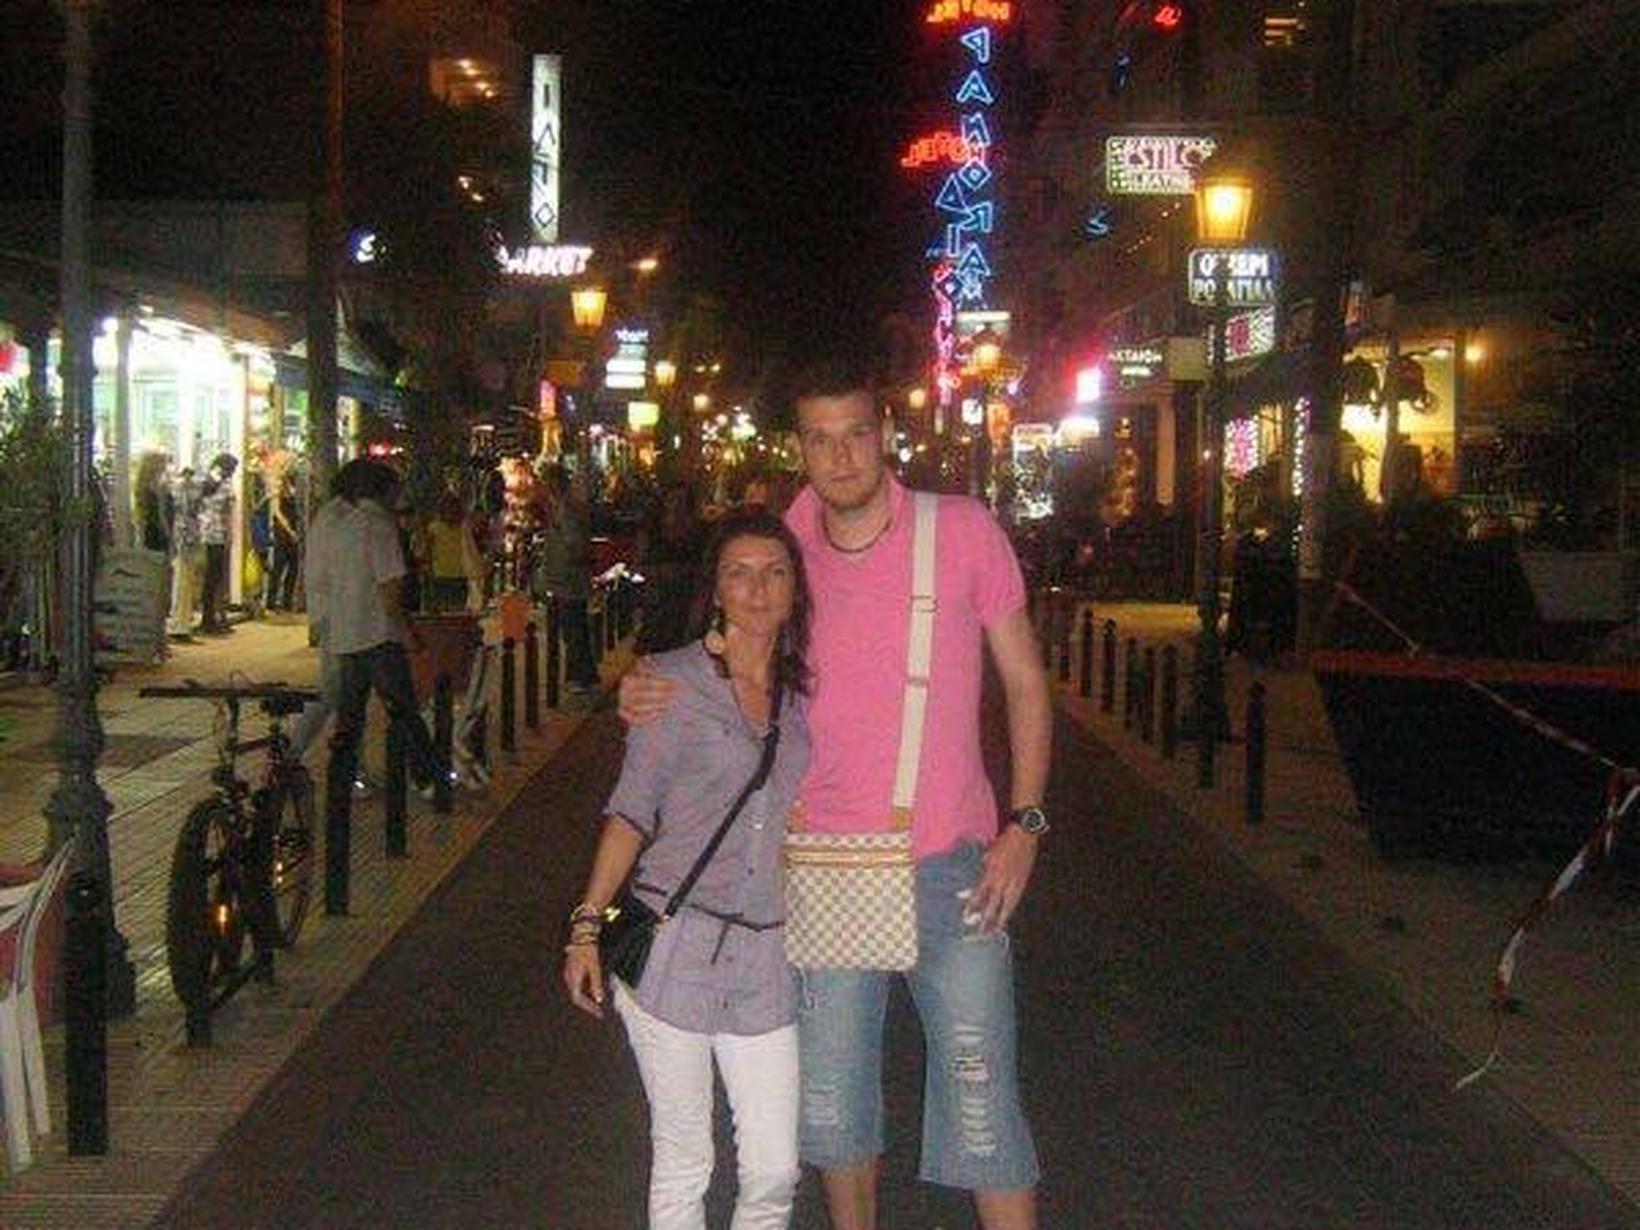 Beata & Istvan from London, United Kingdom